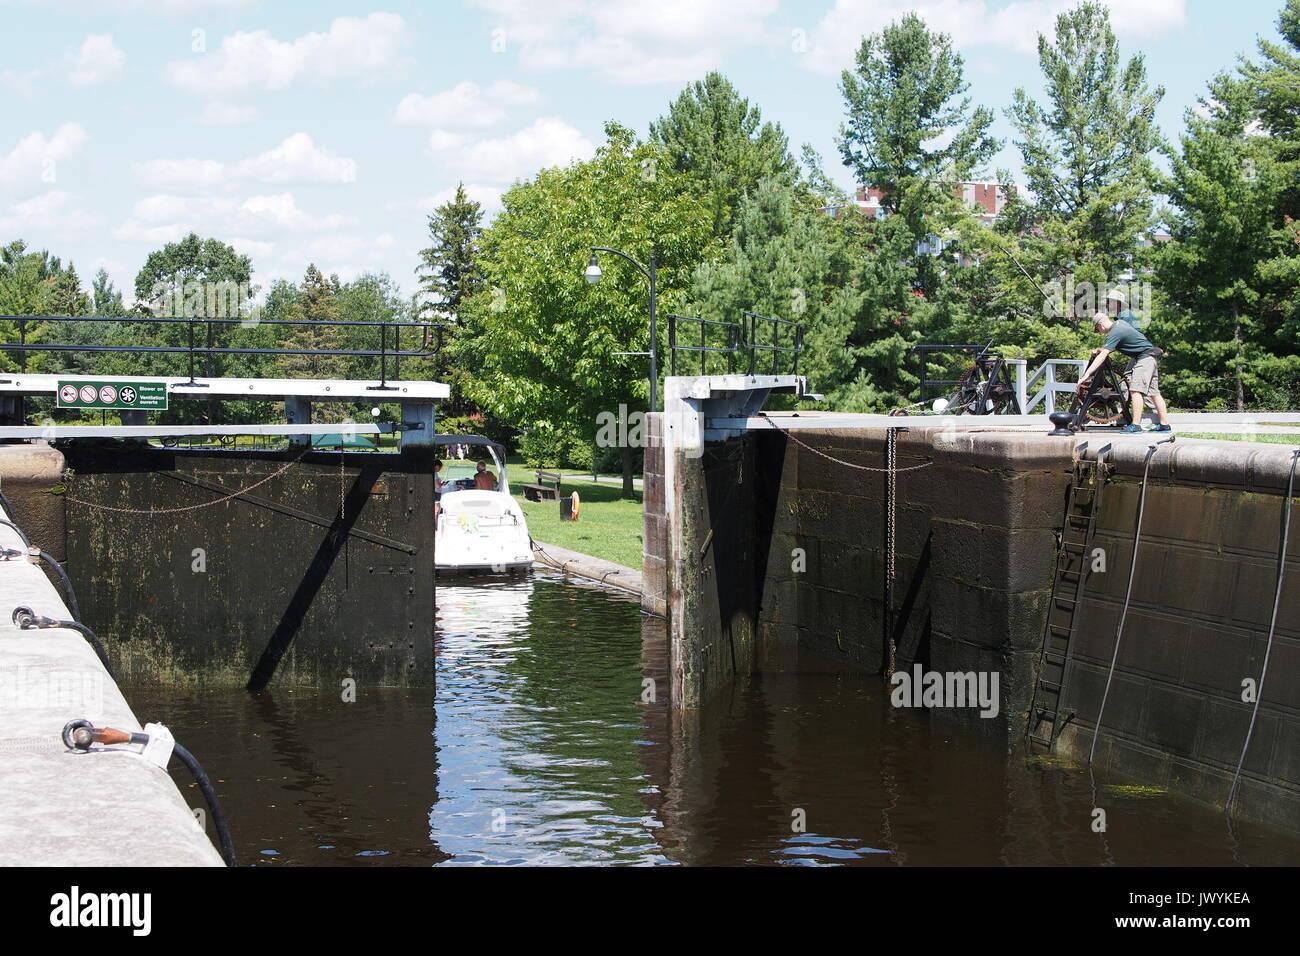 Open bottom lock gate at Carleton University, Rideau Canal, Ottawa, Ontario, Canada. - Stock Image